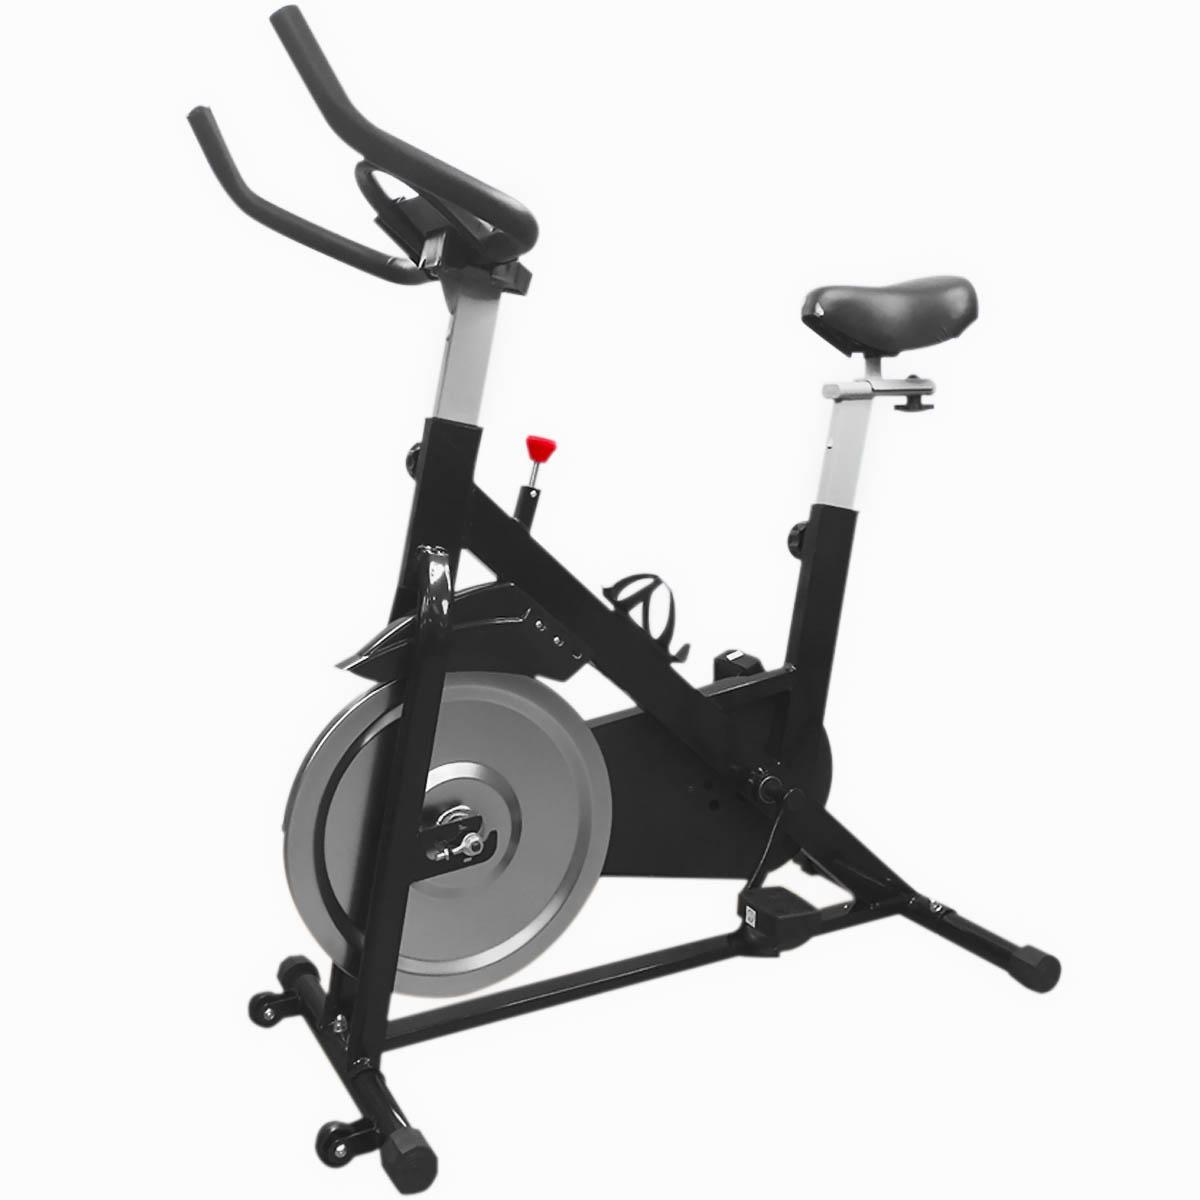 Bicicleta Fija De Spinning Ciclismo Interior Cardio Fitness